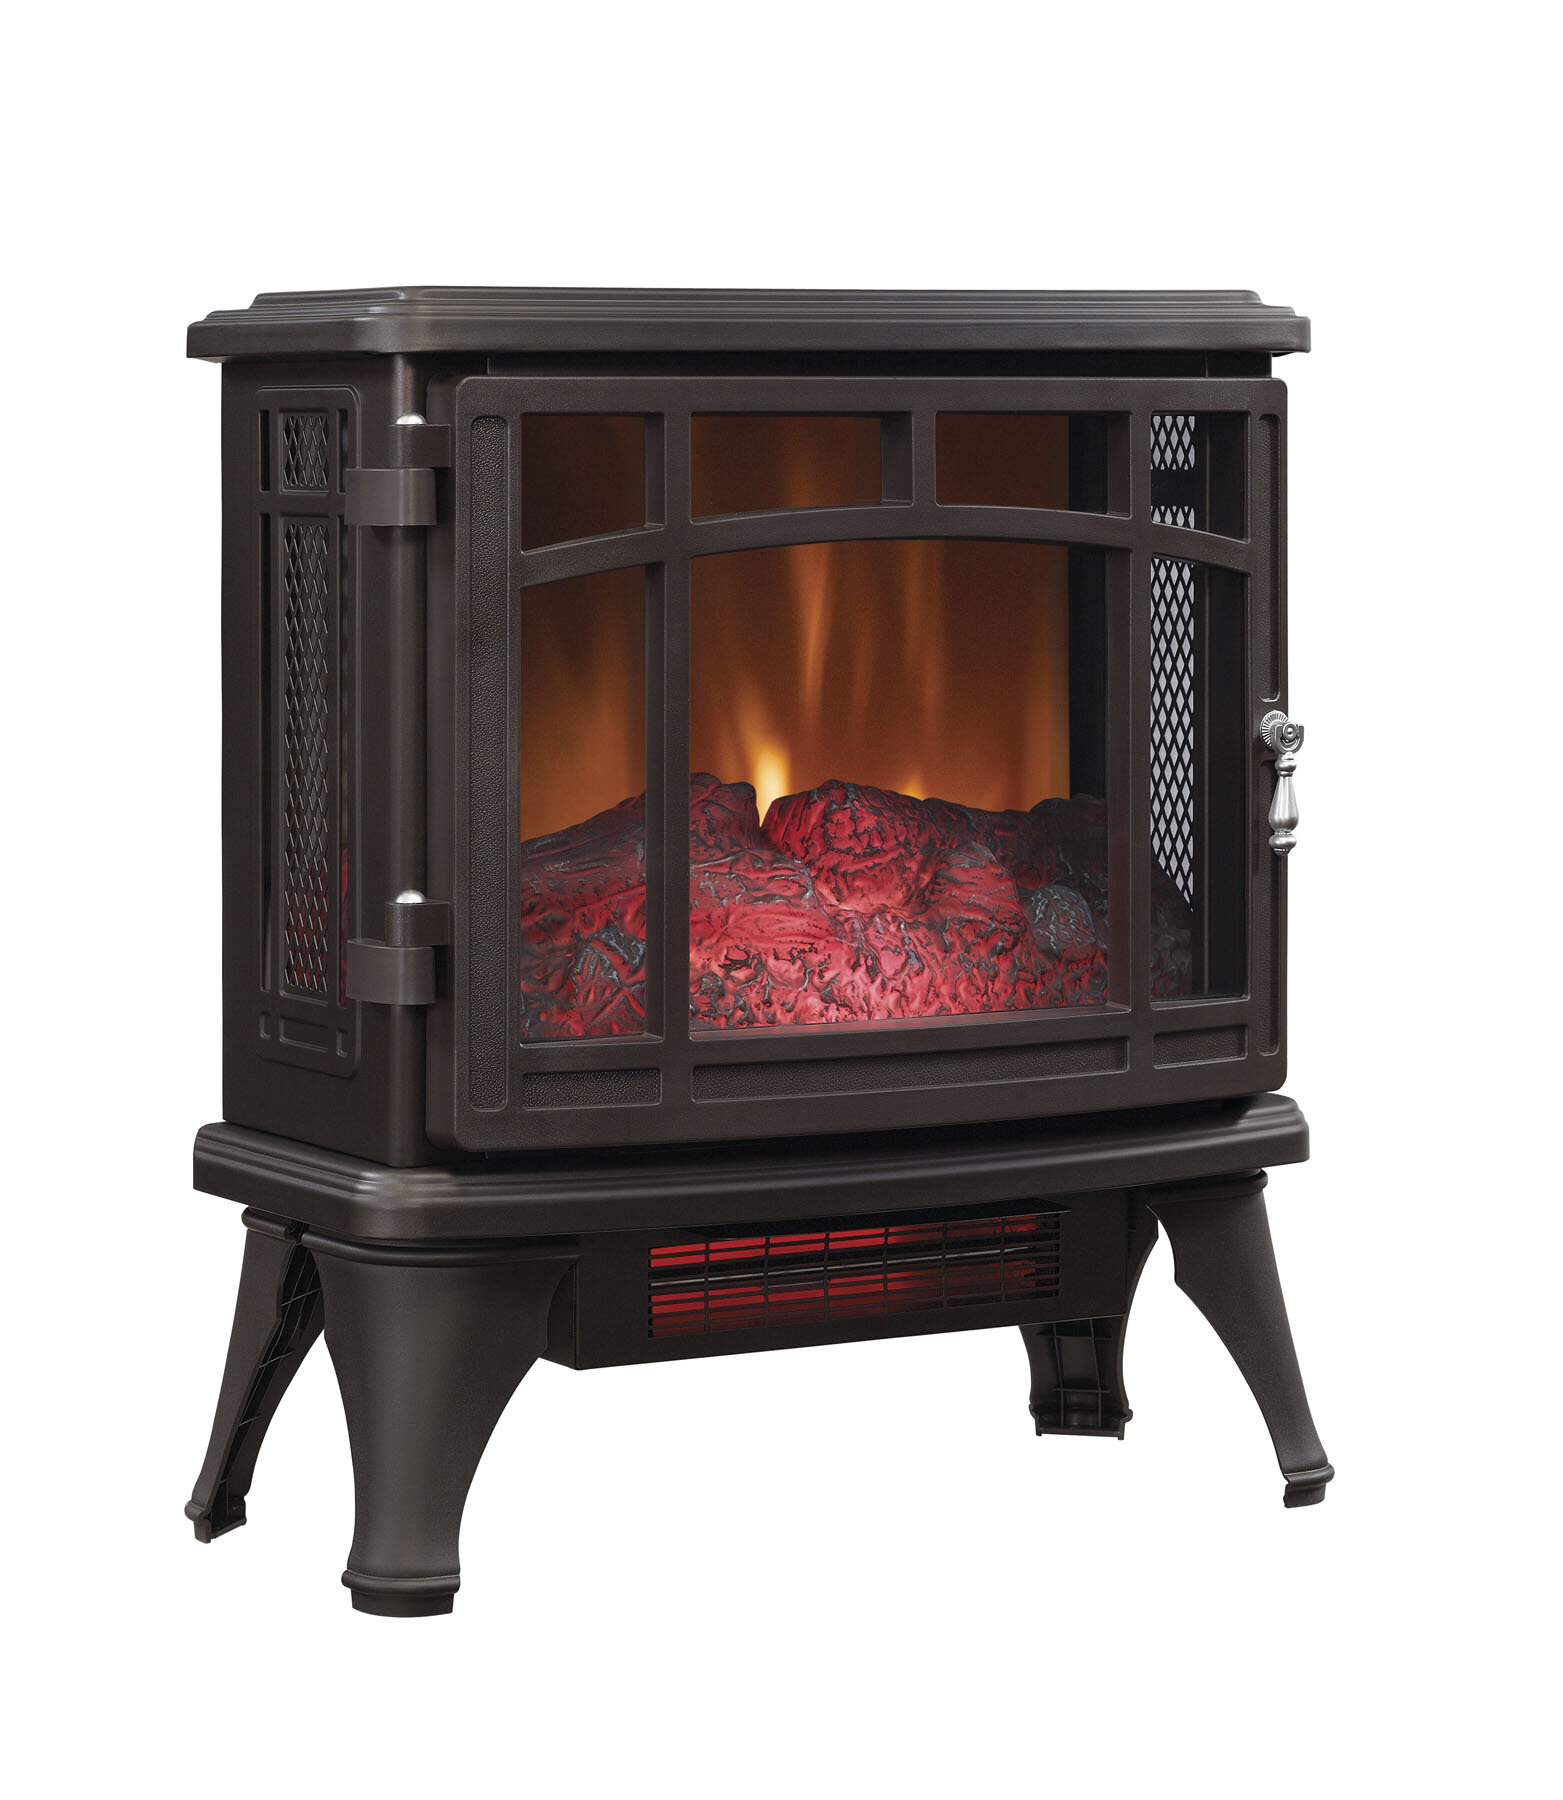 Duraflame 1500 Watt Portable Electric Infrared Cabinet Heater